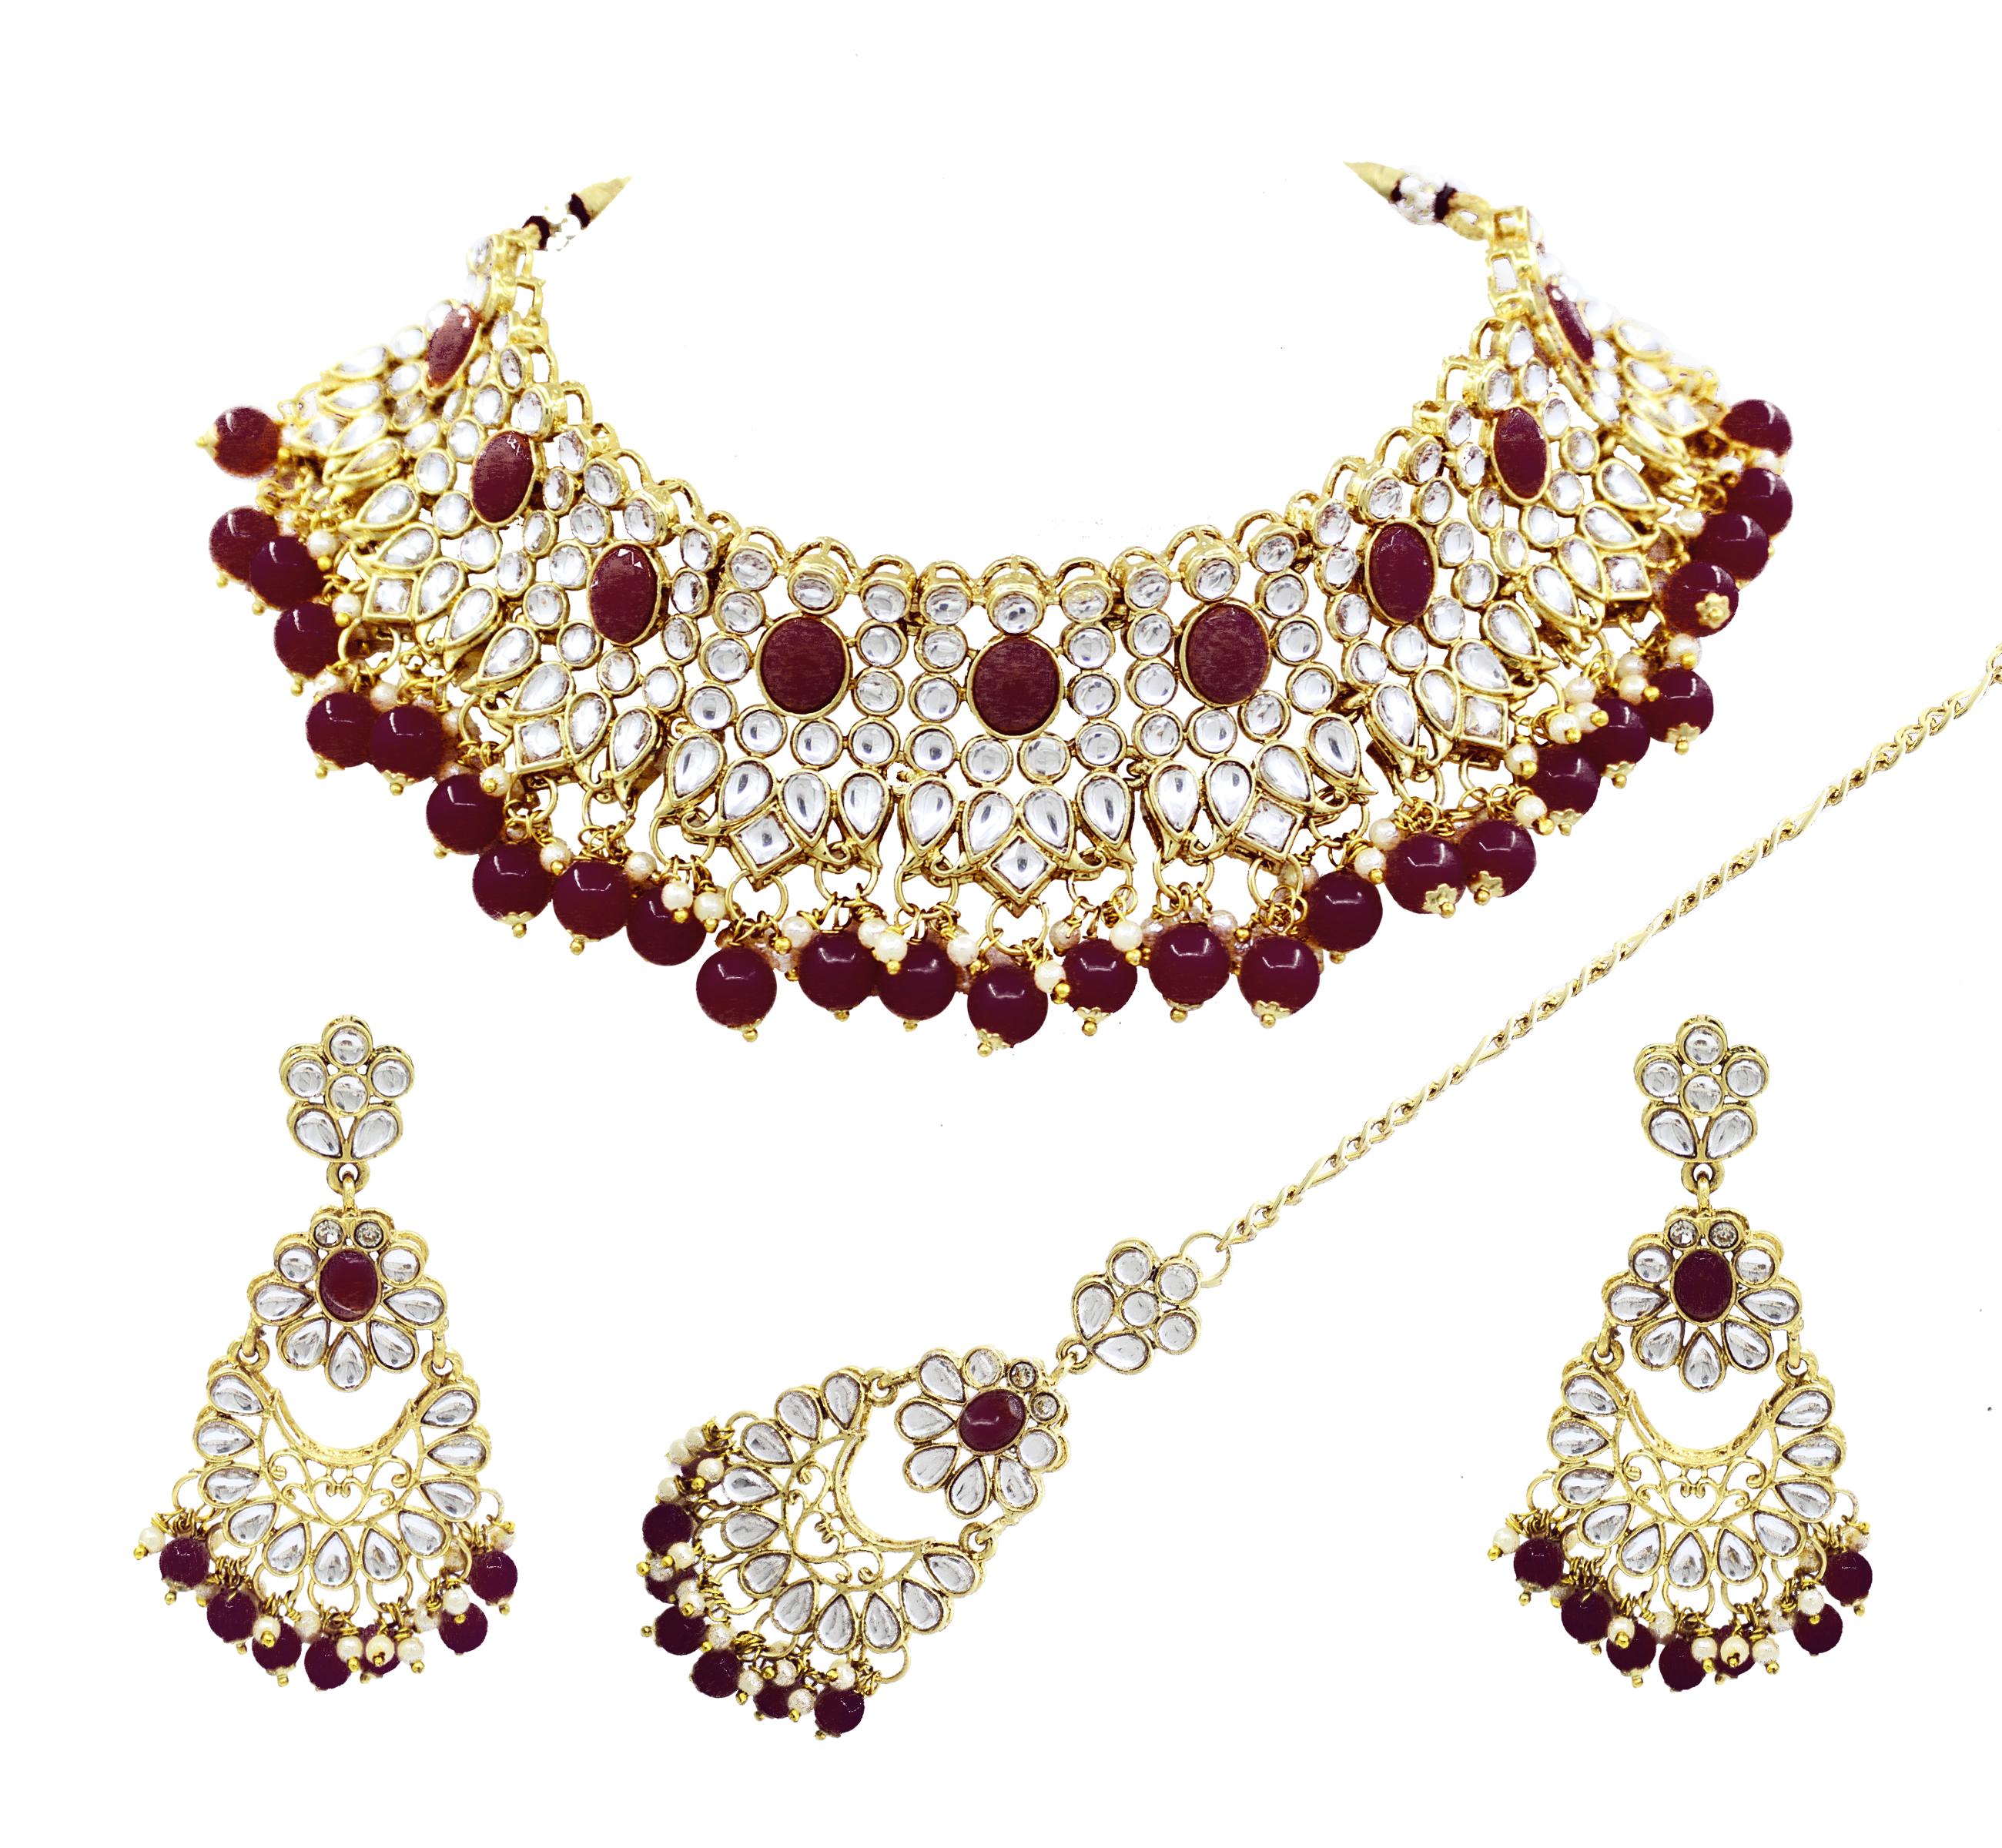 Party Wear Gold Plated Maroon Color Kundan Choker Necklace Earring With Maangtikka Jewellery Set